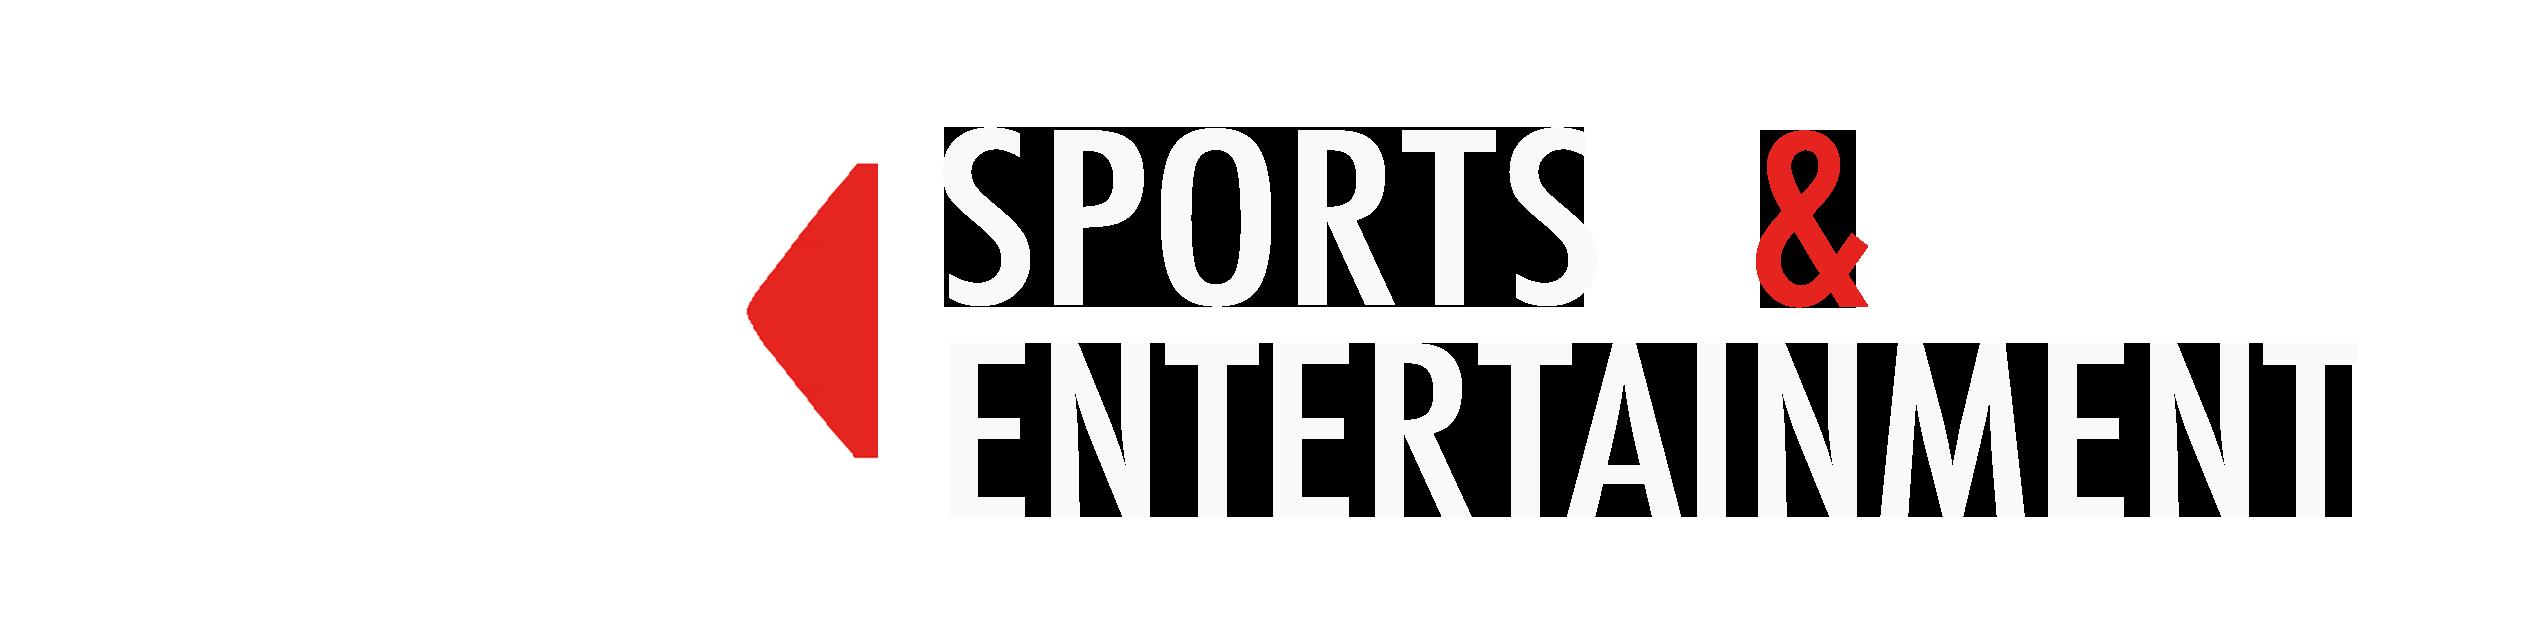 4e4610efbe7 Sports Tickets - Sports Travel - Sports Memorabilia - Sports Marketing